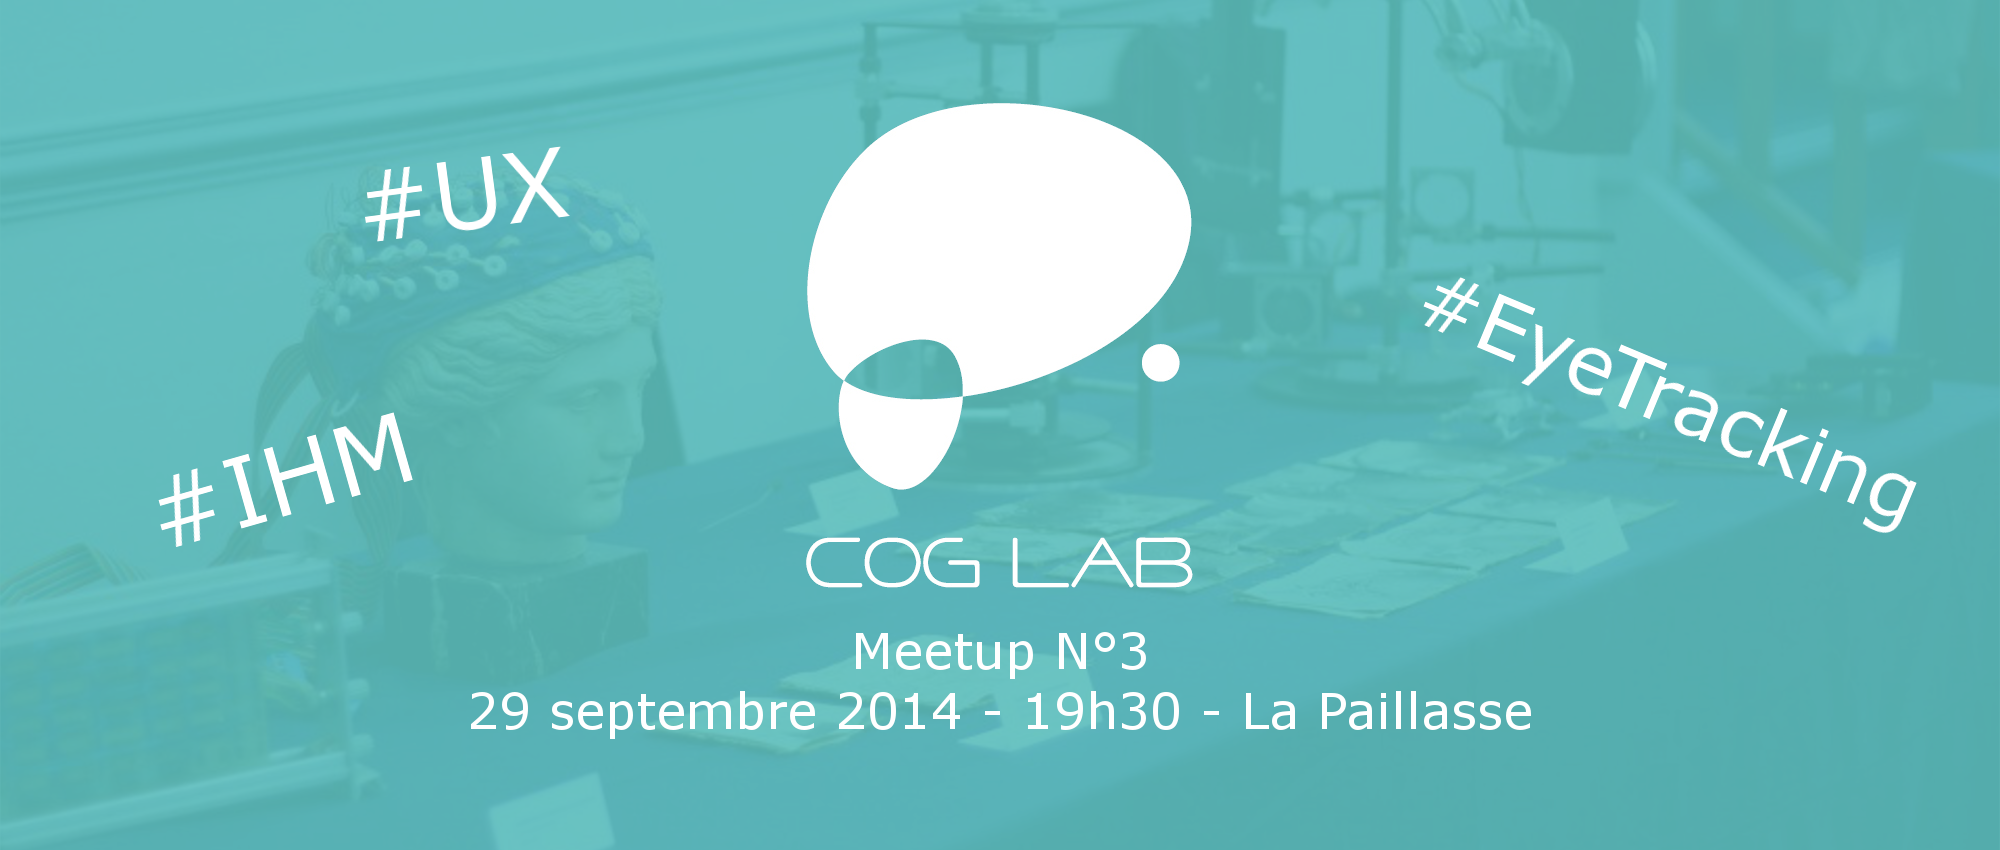 Meetup CogLab 3